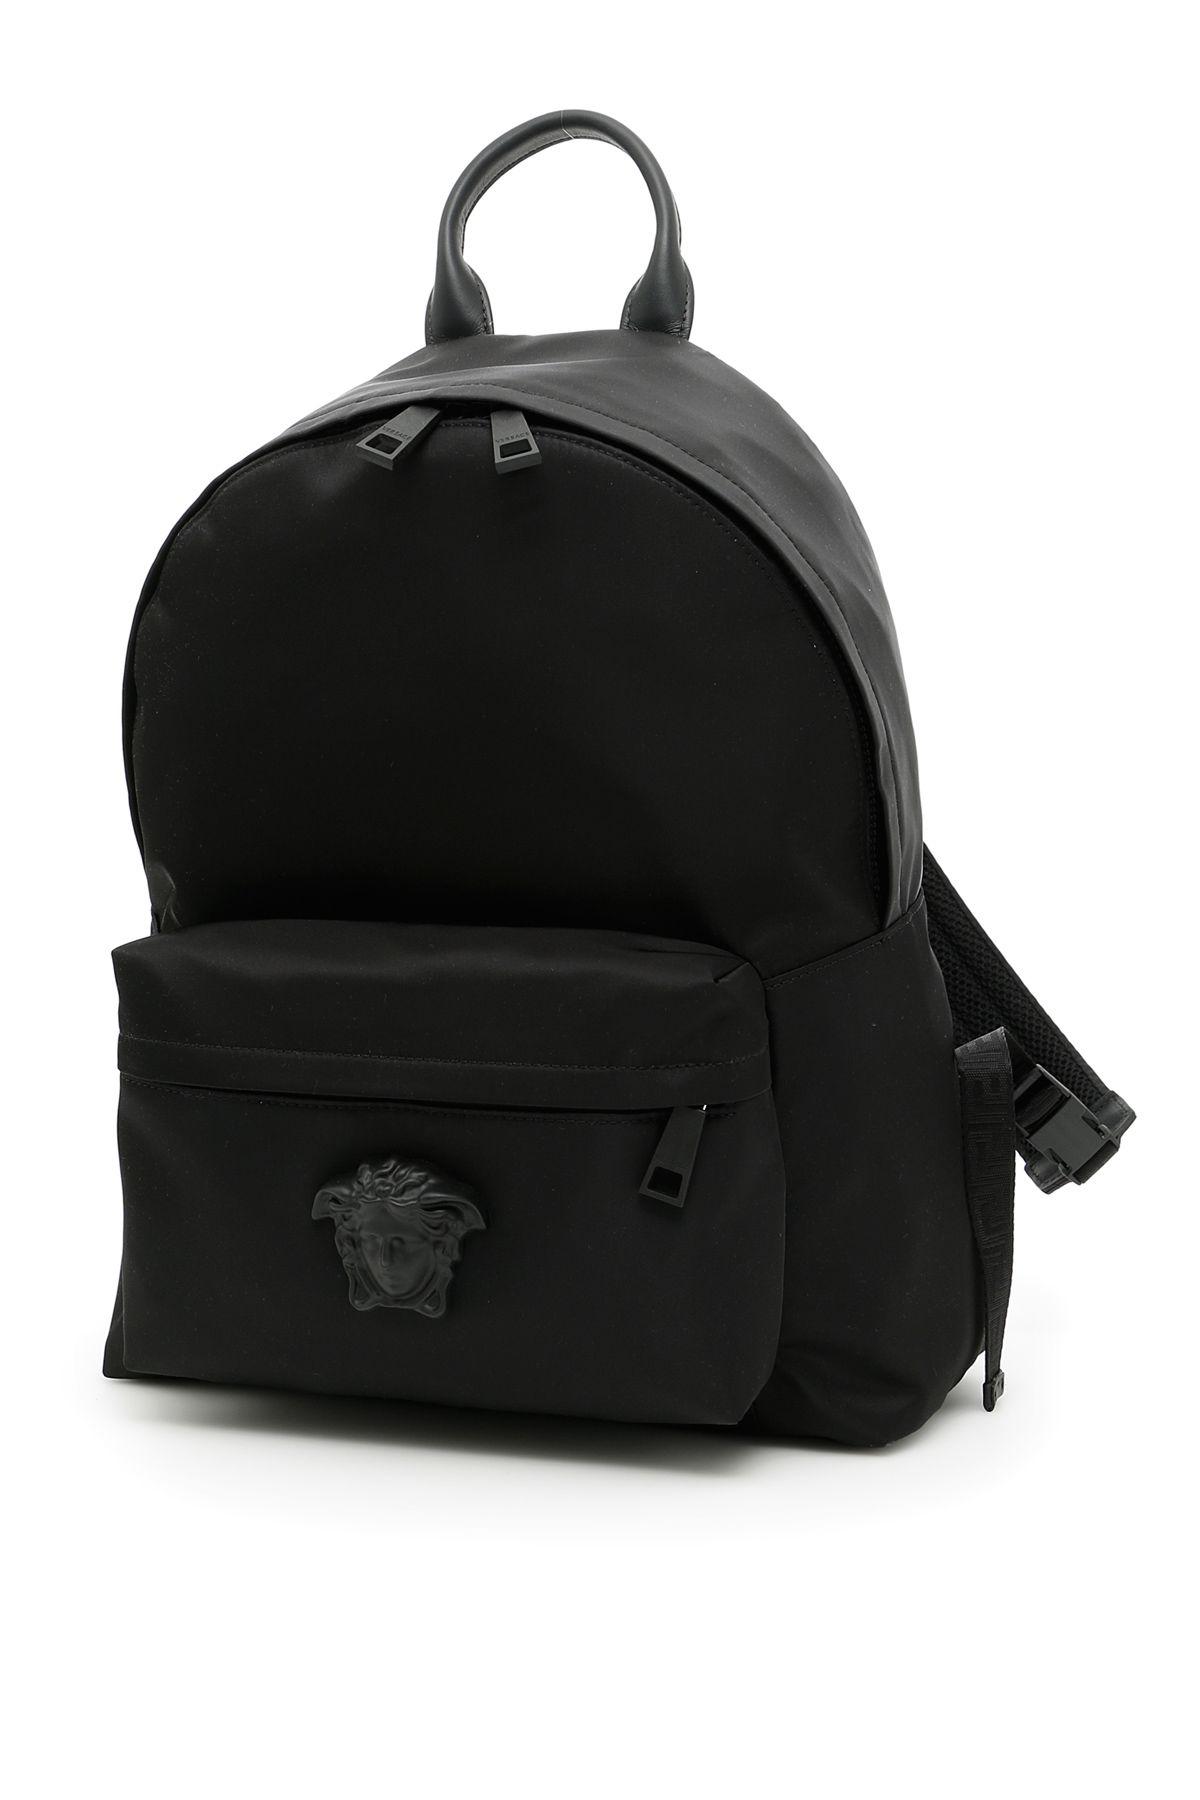 VERSACE Medusa Nylon & Leather Backpack, Nero+Neronero